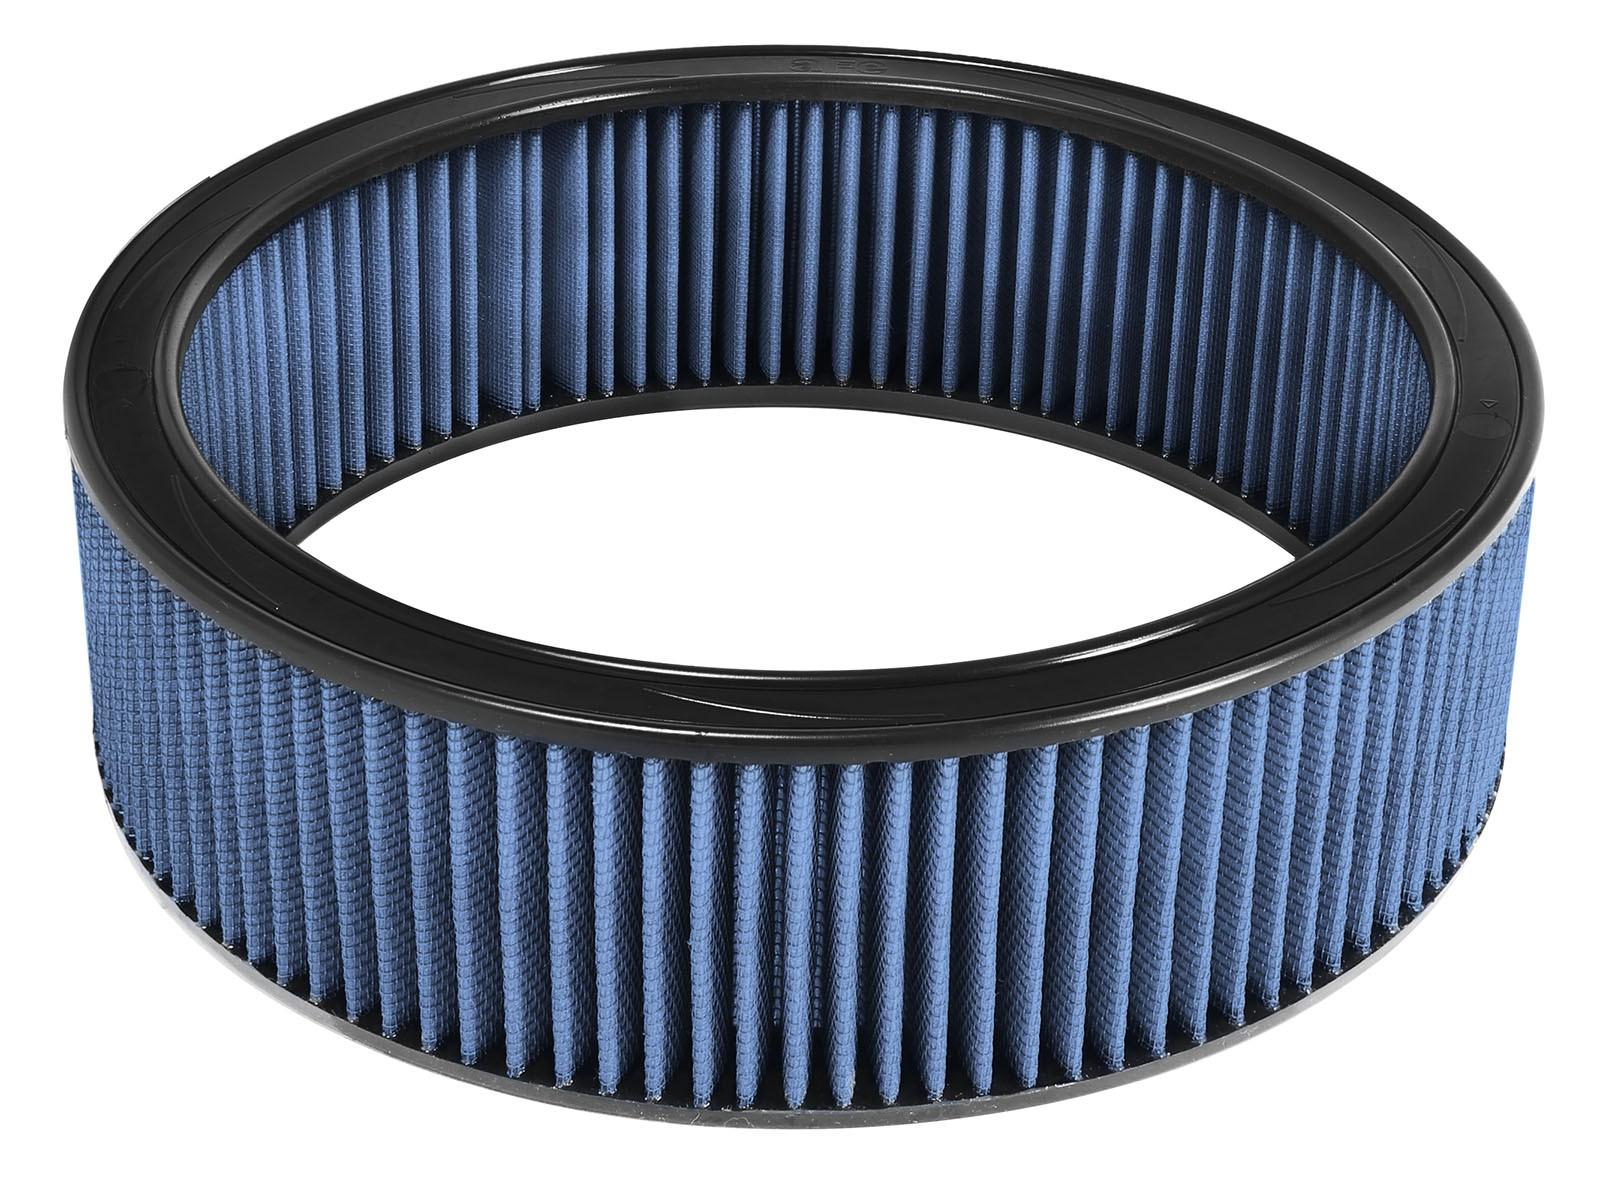 aFe POWER 10-10013 Magnum FLOW Pro 5R Air Filter